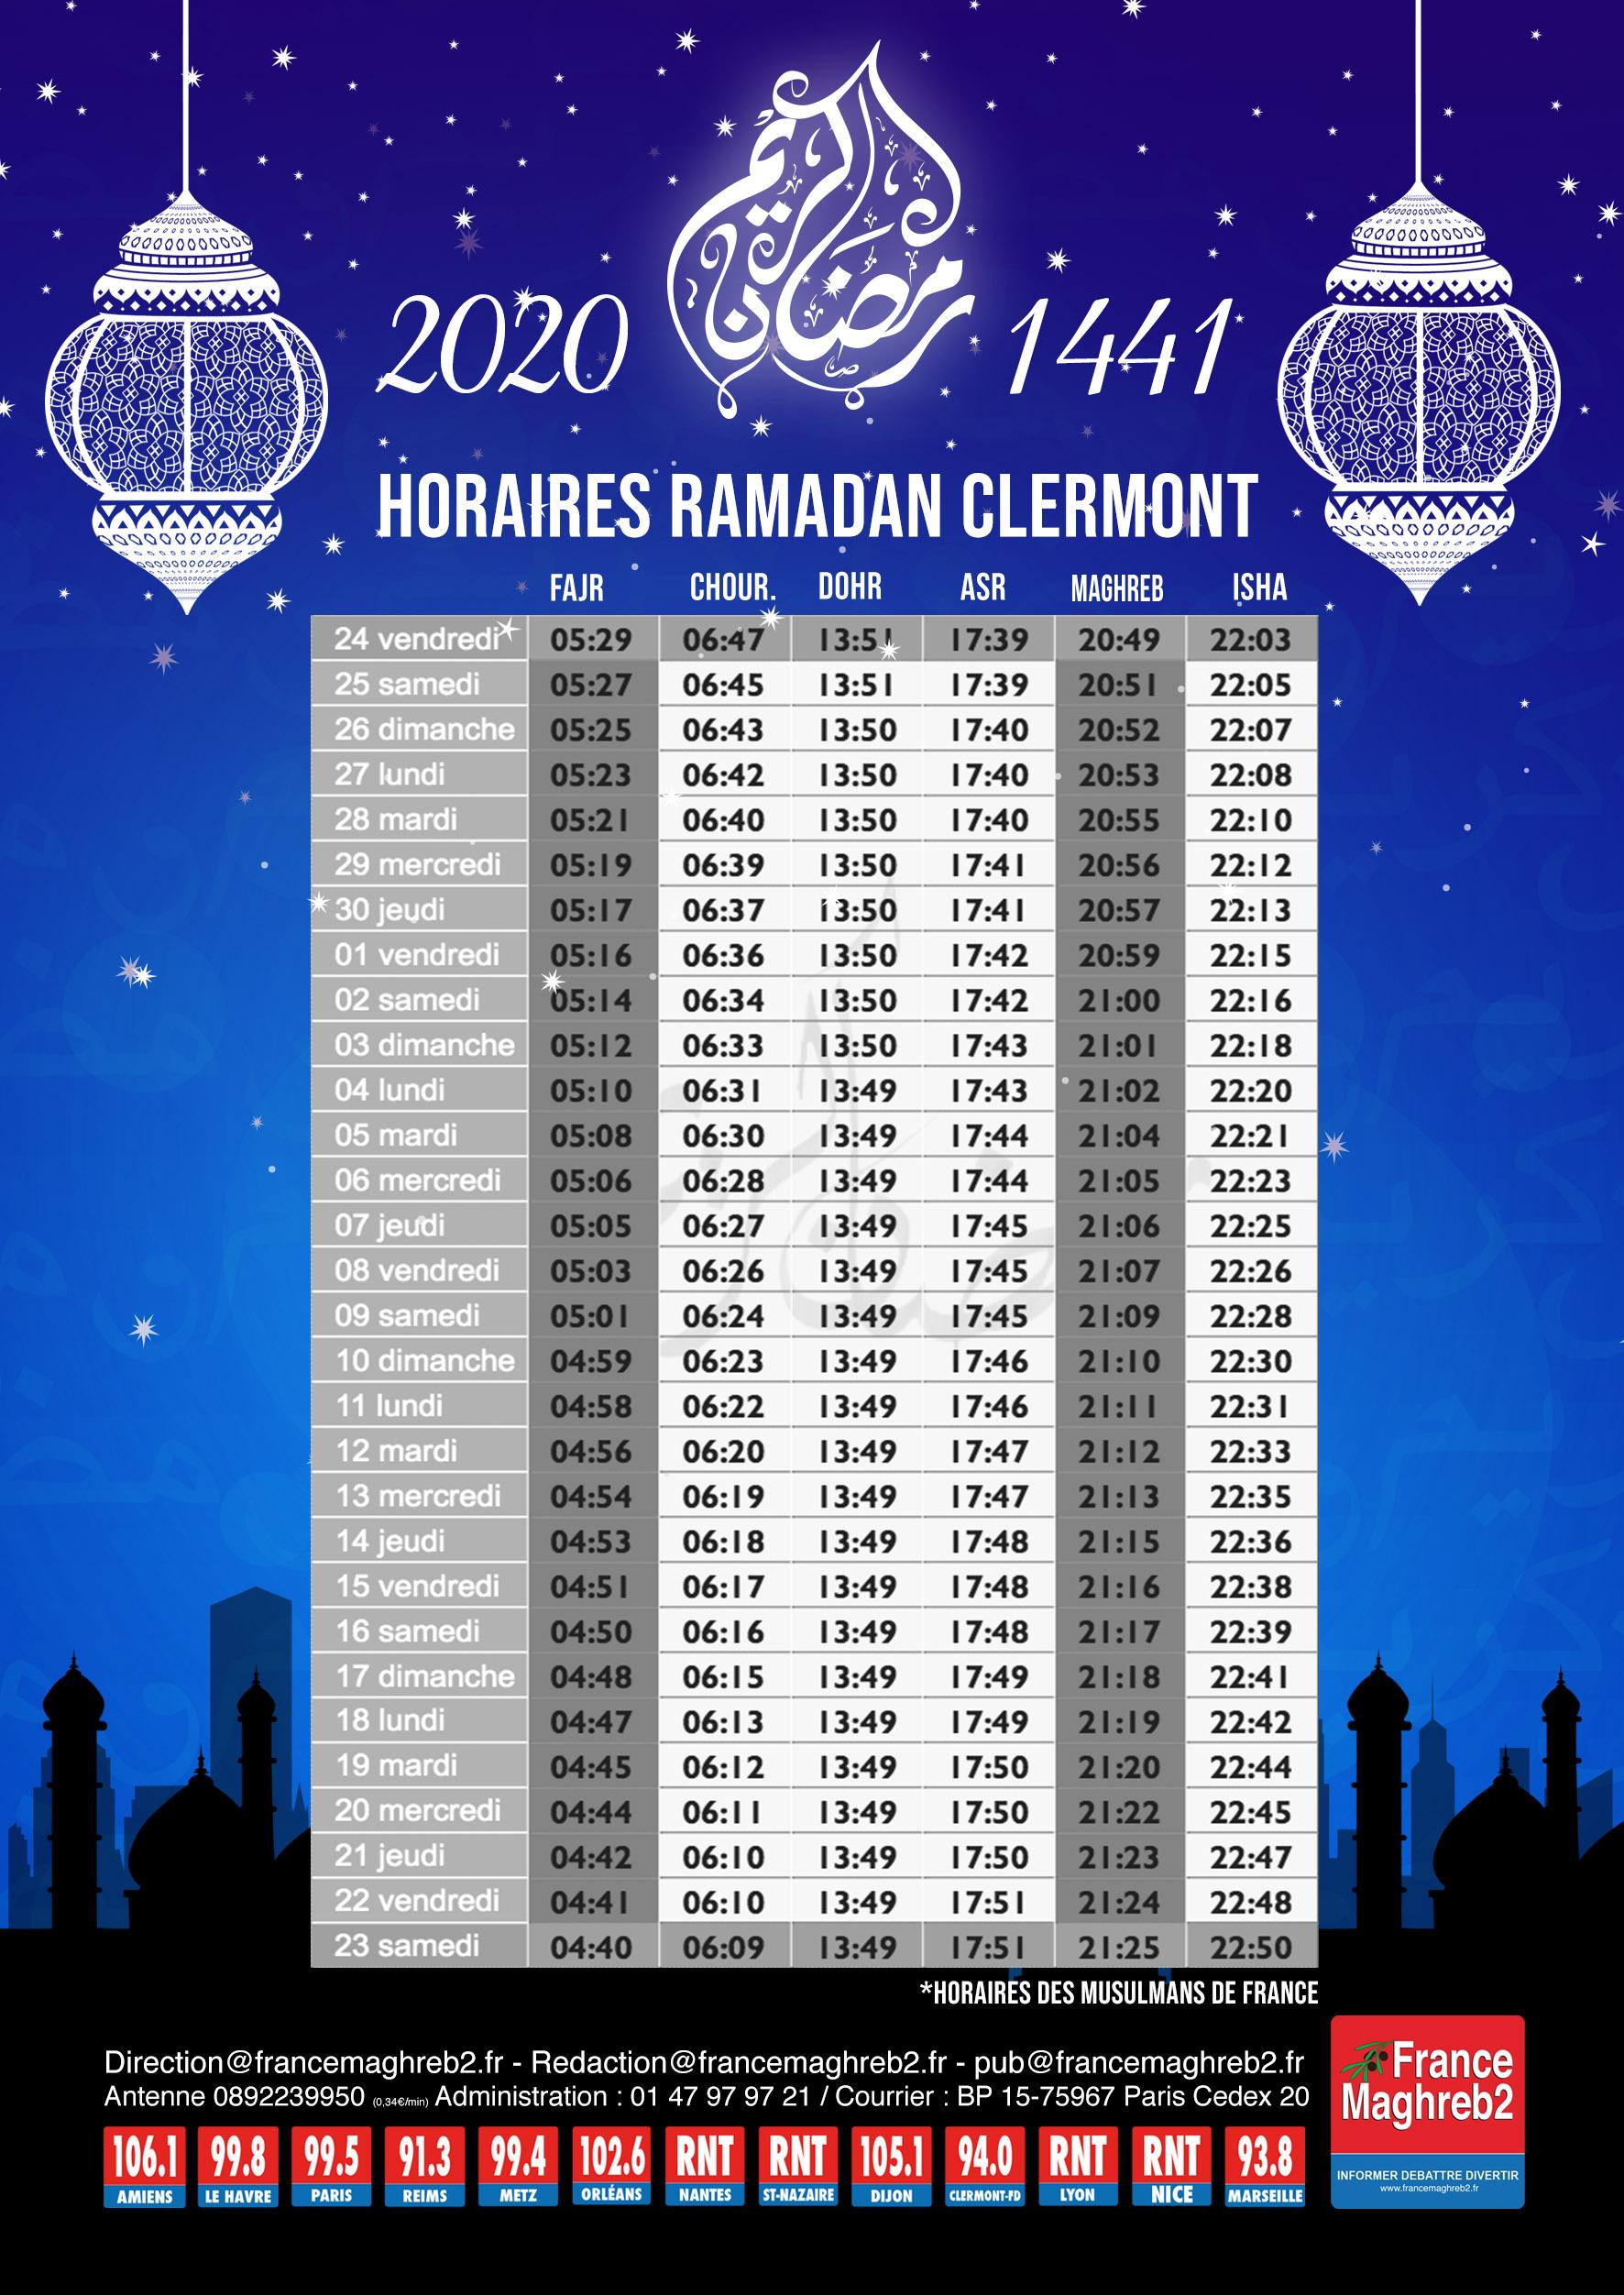 Horaires Ramadan 2020   France Maghreb 2